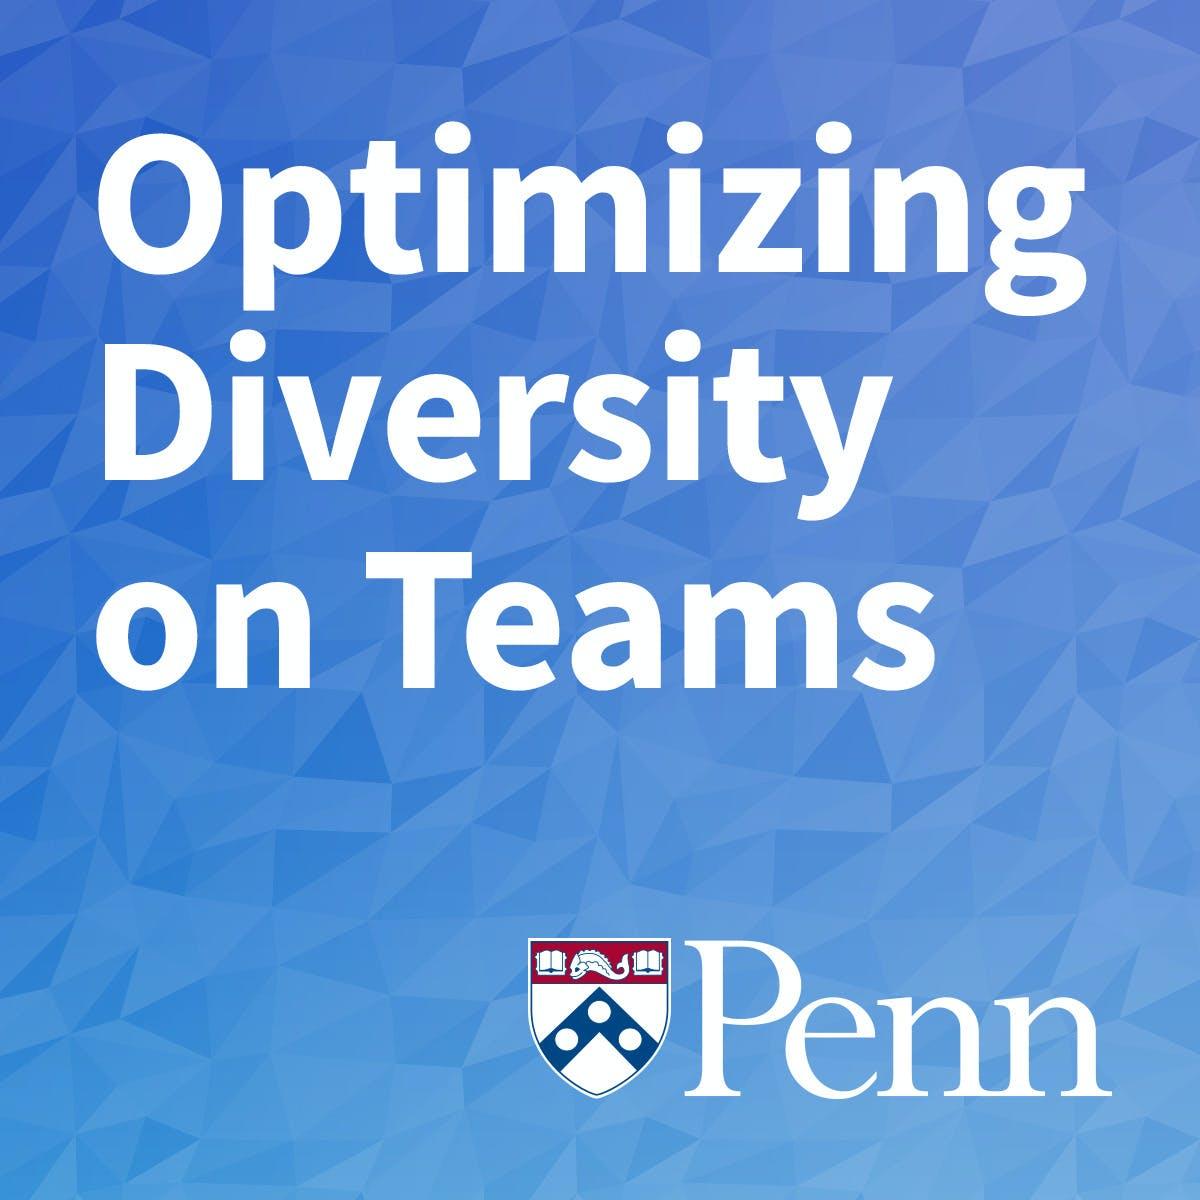 Optimizing Diversity on Teams